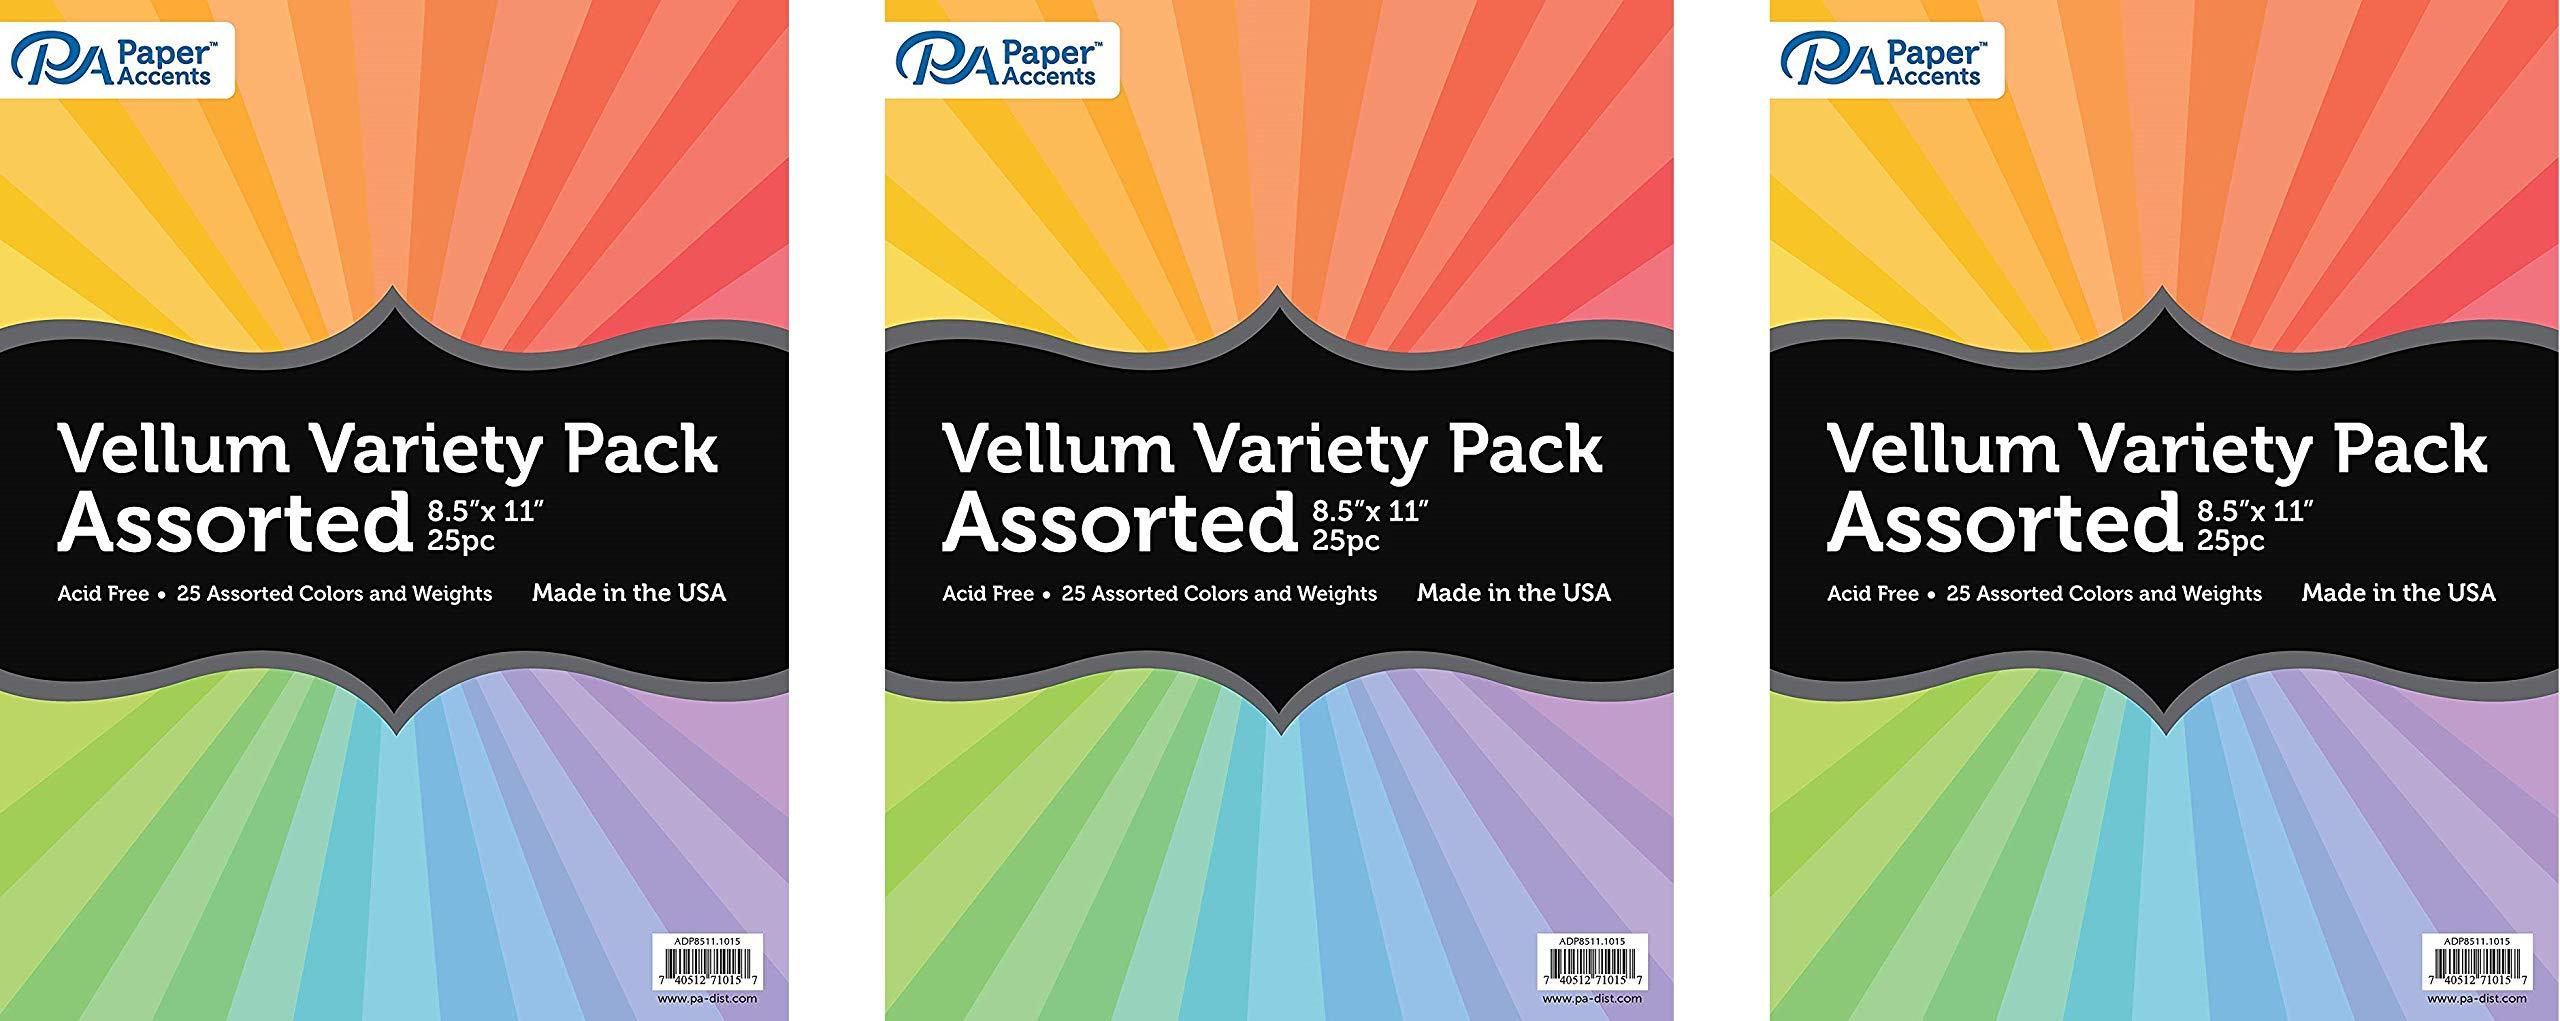 PA Paper Accents ADP8511.1015 Assorted Vellum, 8.5''x 11'', (Тhree Pаck)